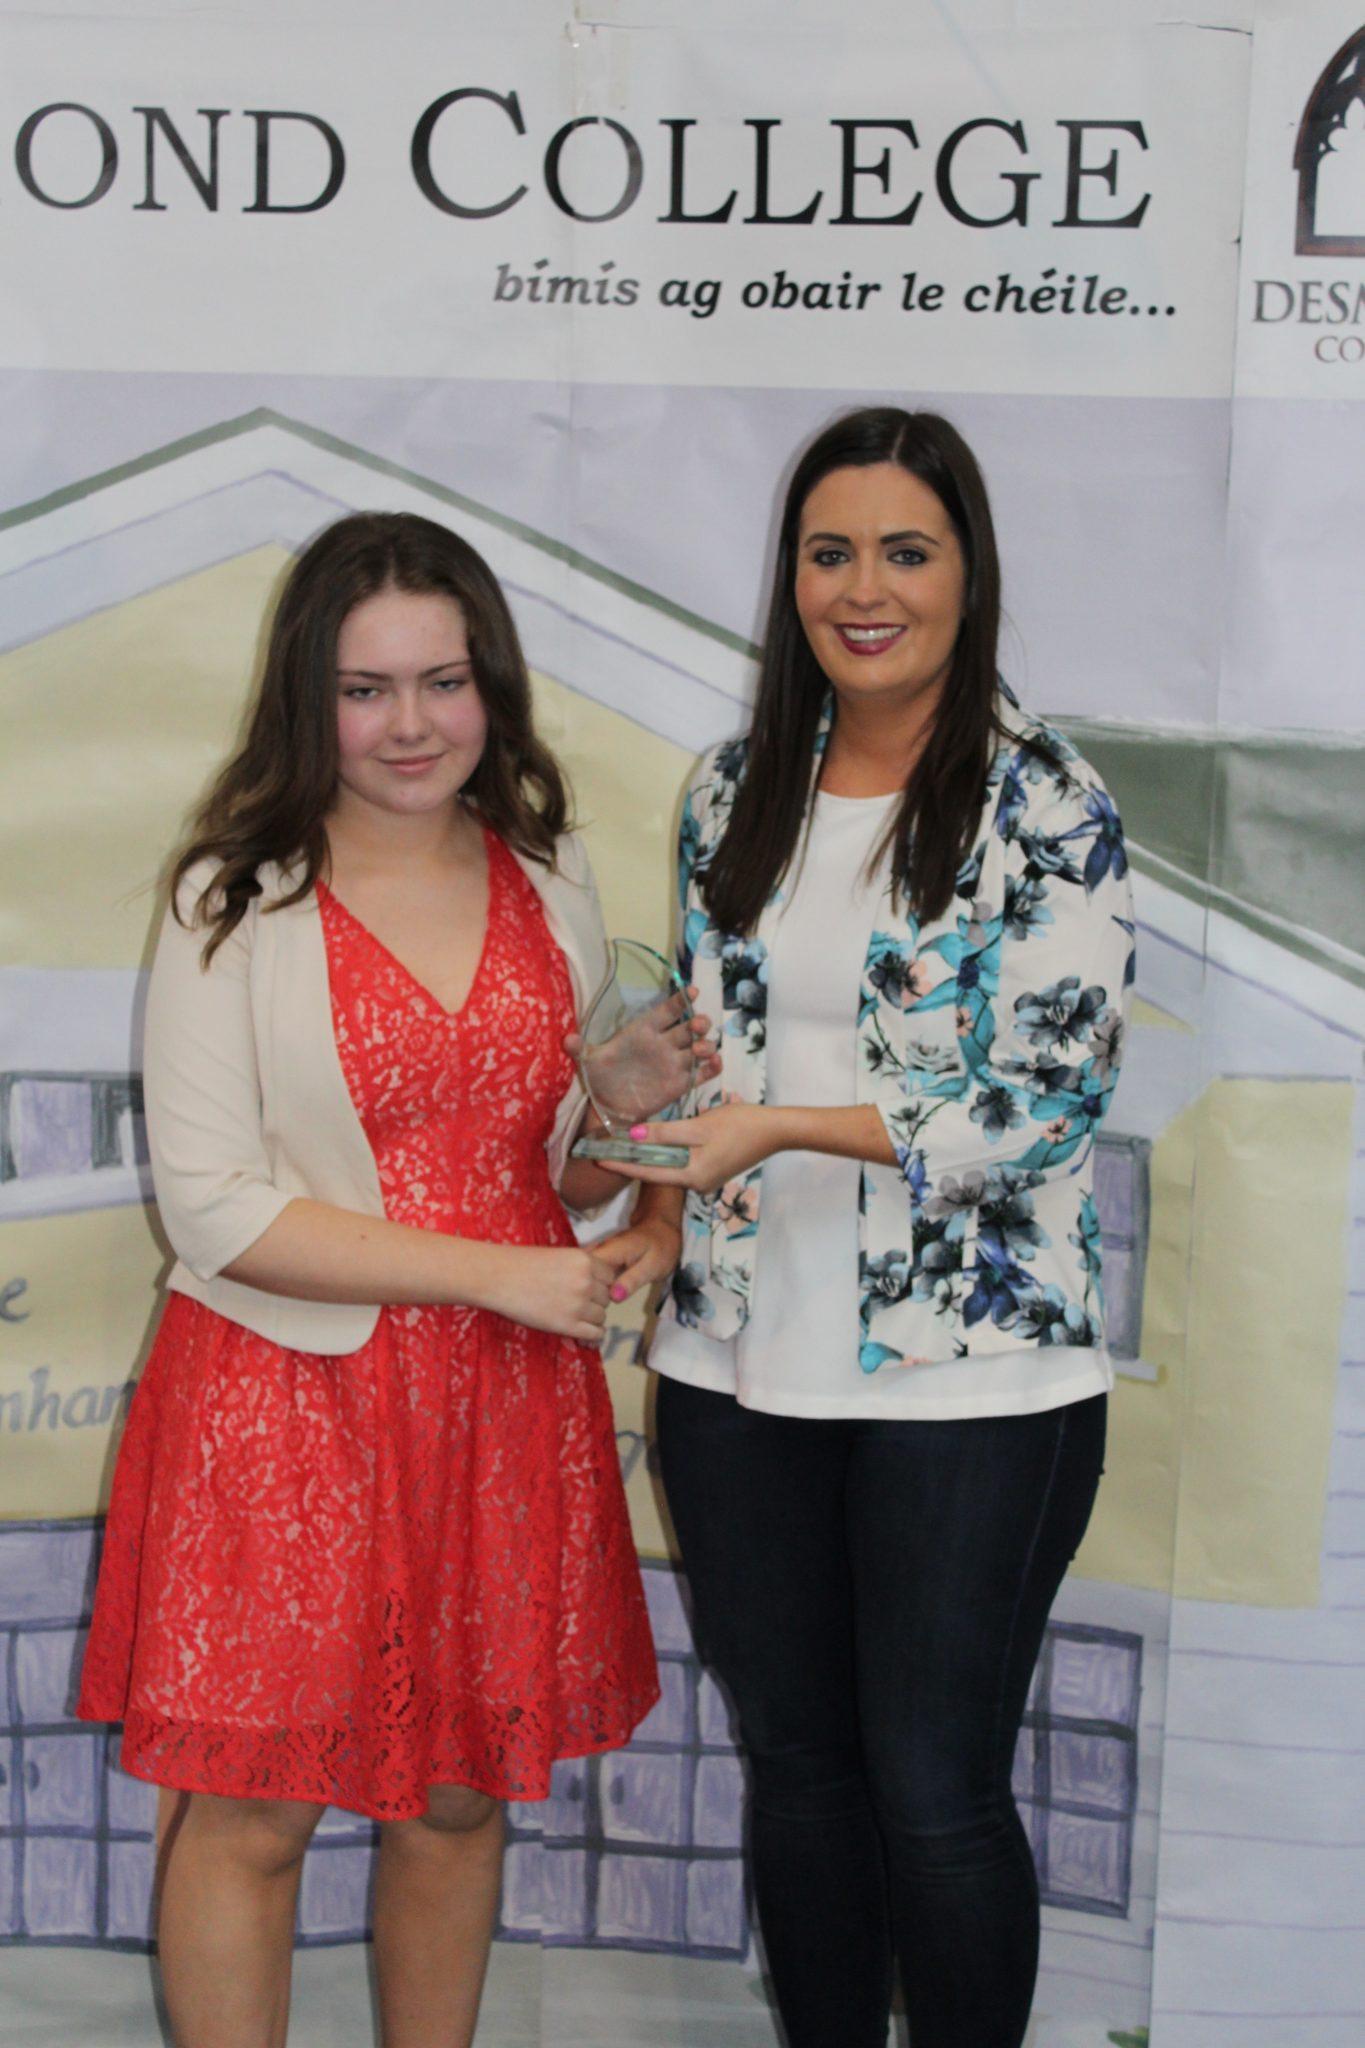 Desmond College Leaving Certificate Graduation 2015: Class Tutor Award: Laura Sexton with Ms Culhane